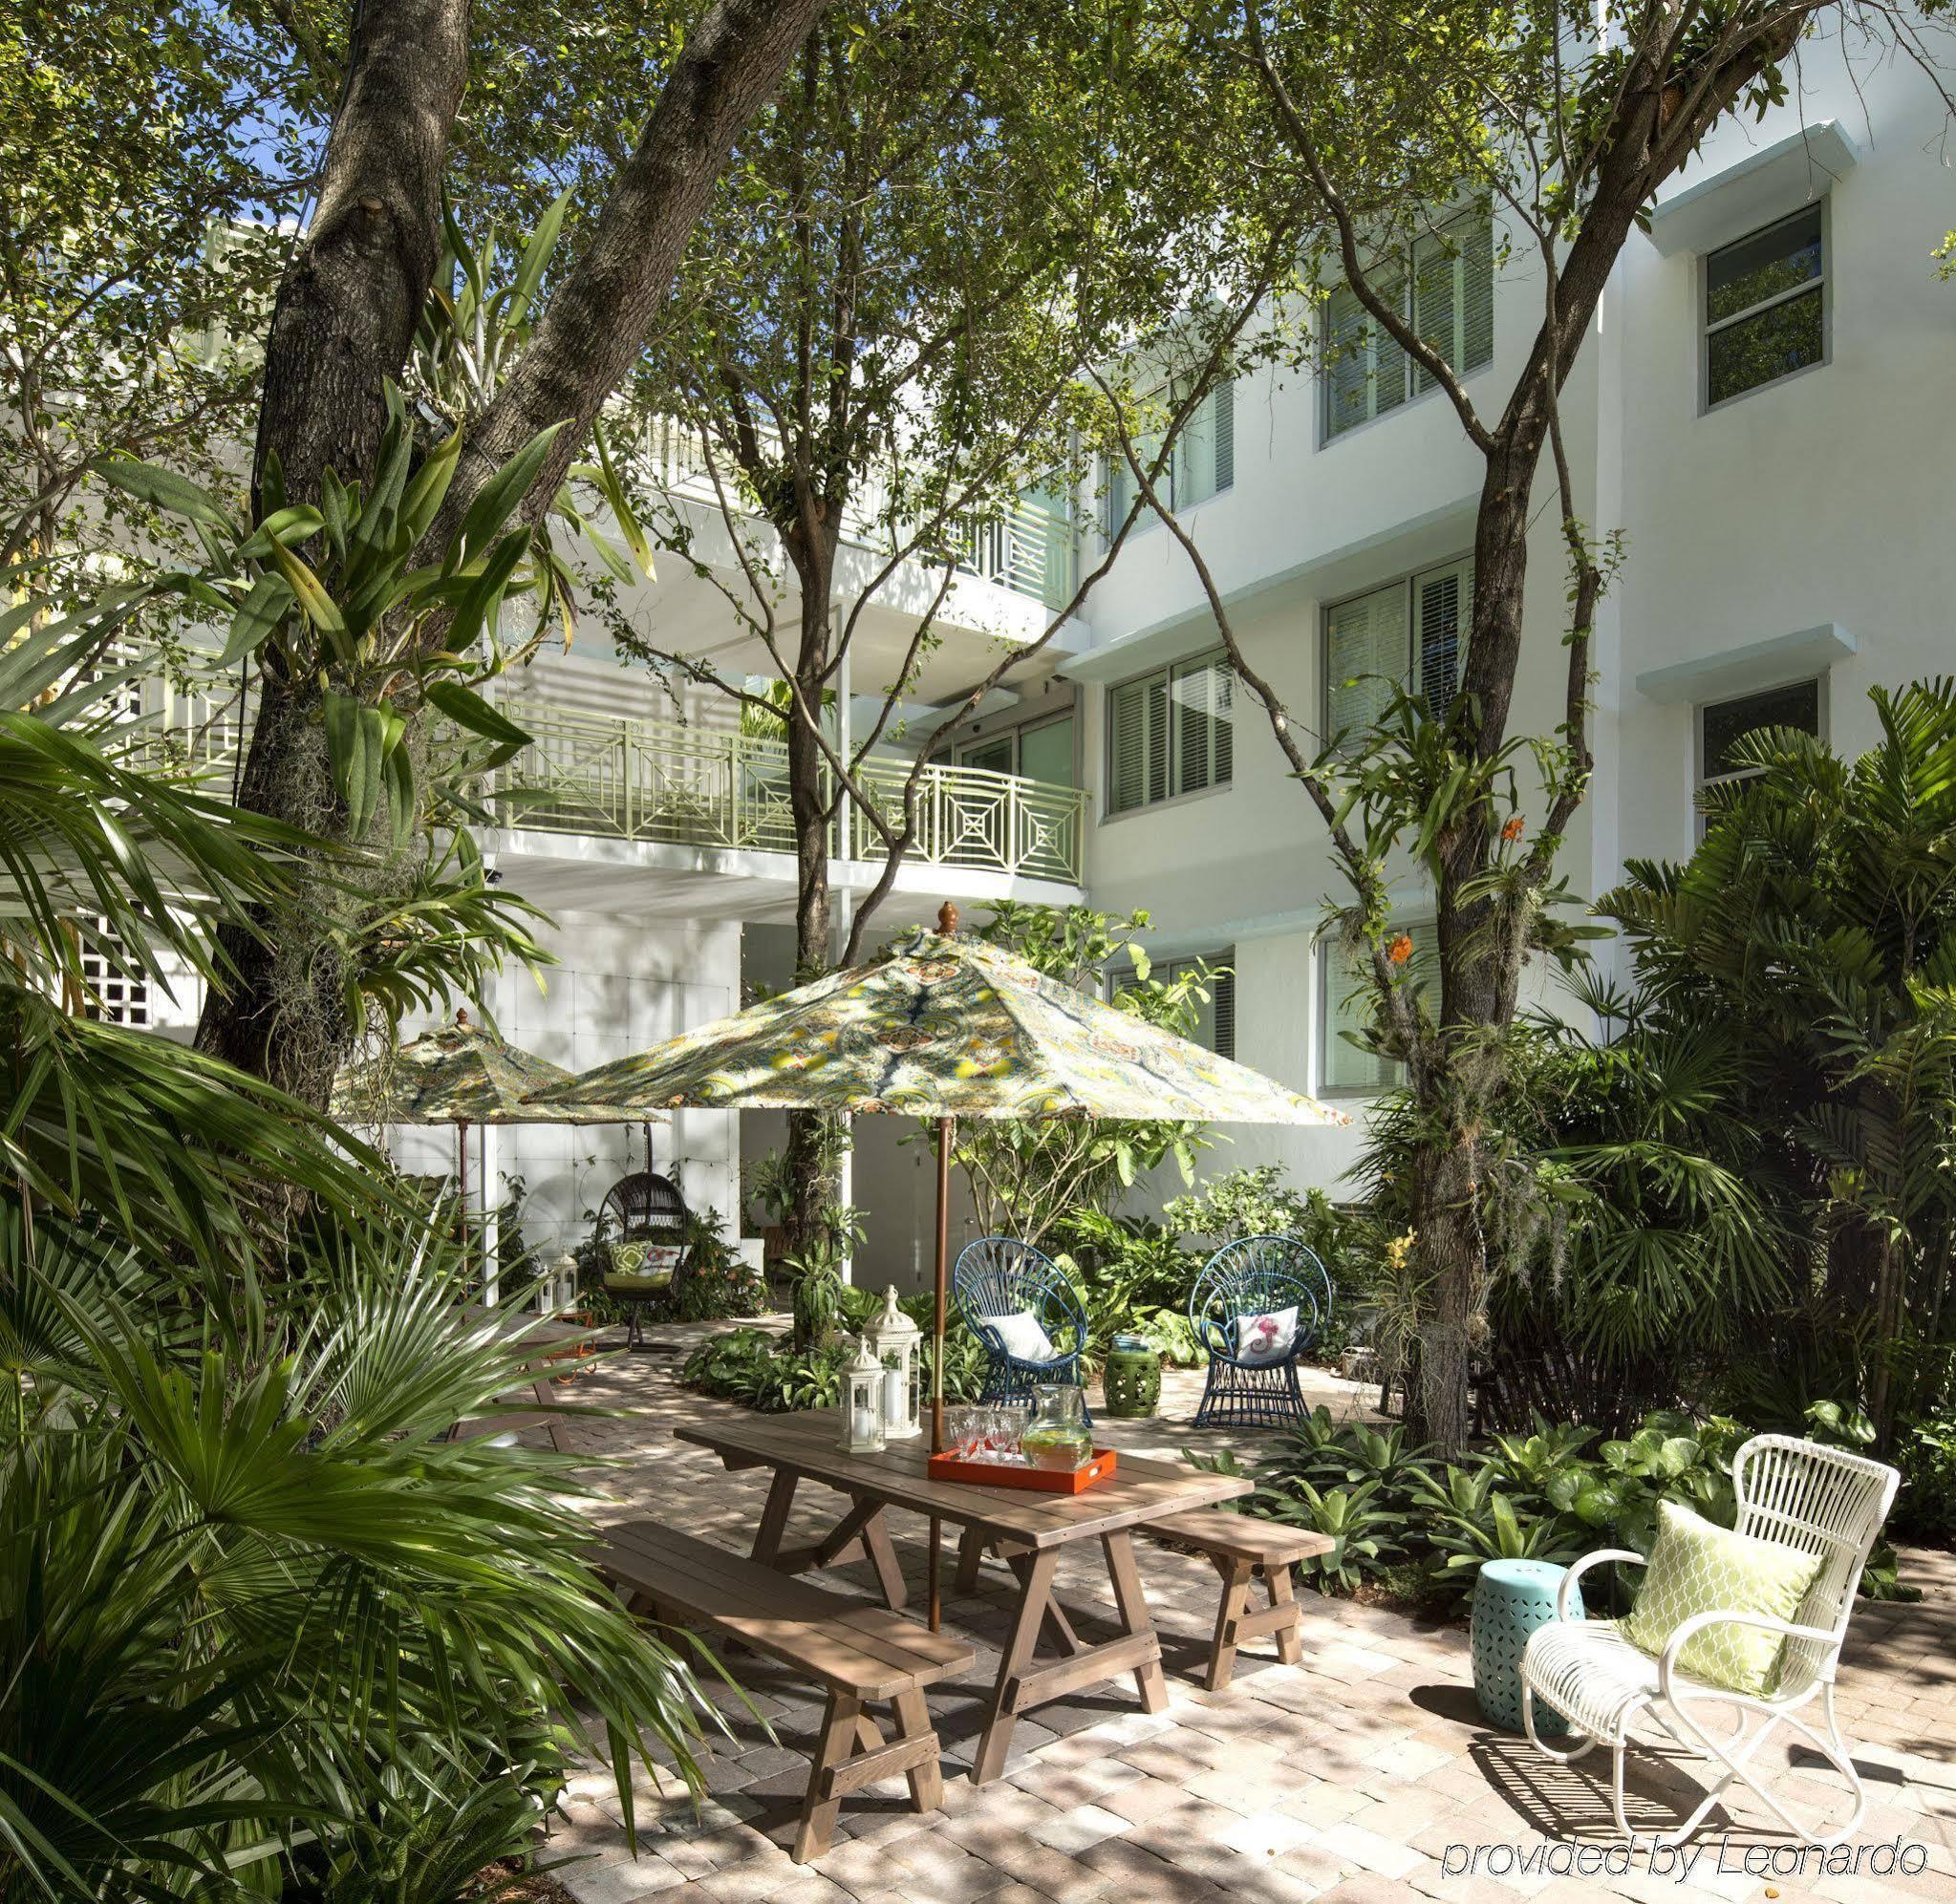 Miami Beach Hotels - Cheap Hotels in Miami Beach | Otel.com